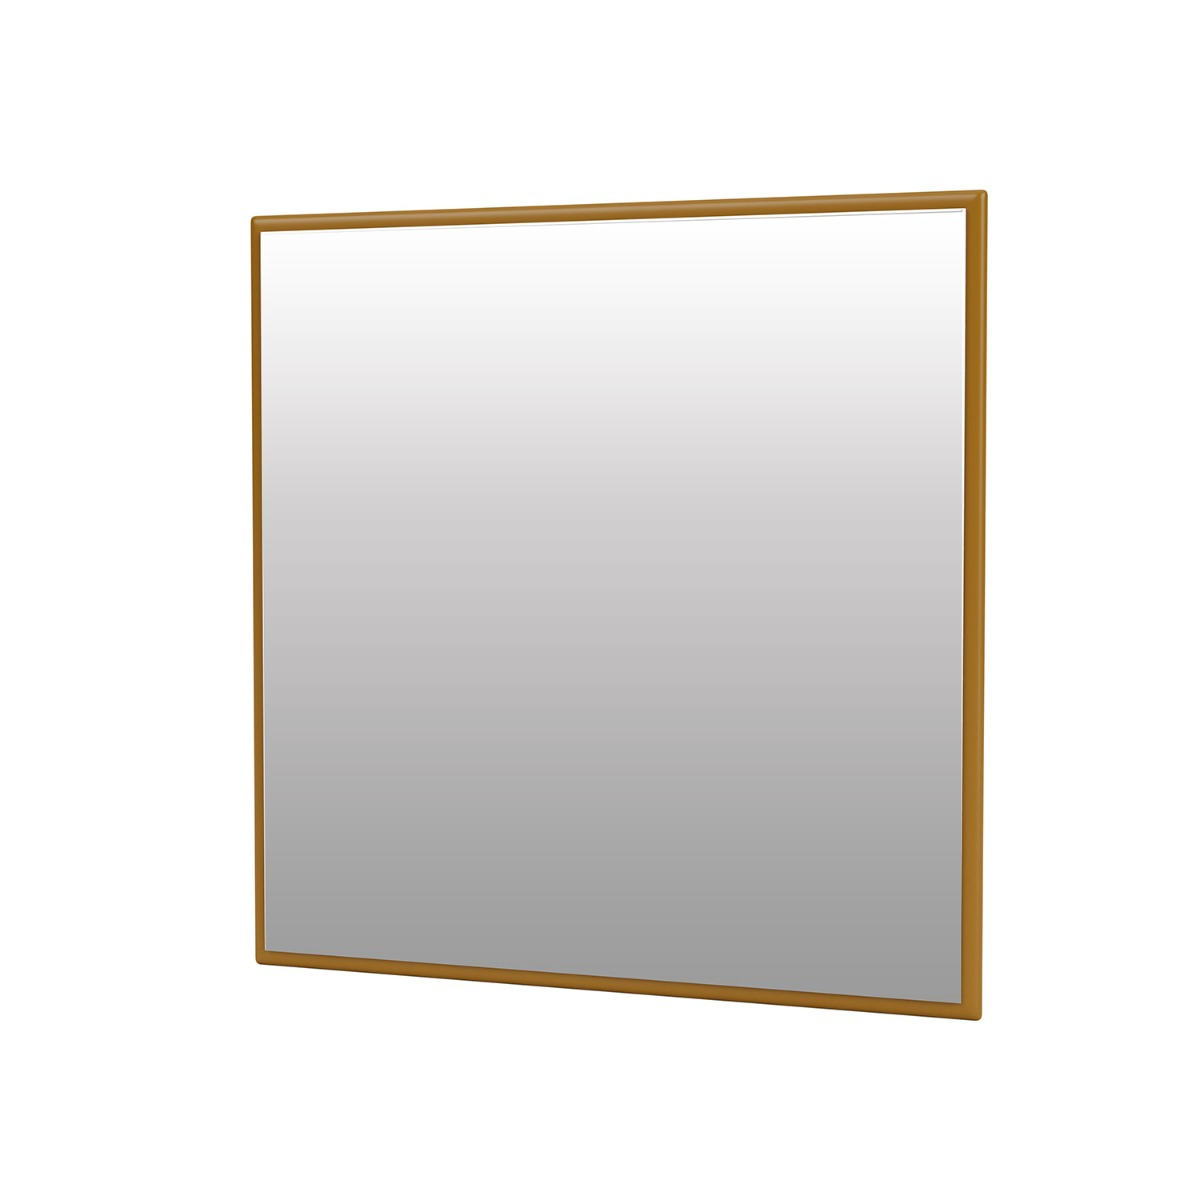 Montana Mini Spegel Fyrkantig 35x35 cm Amber